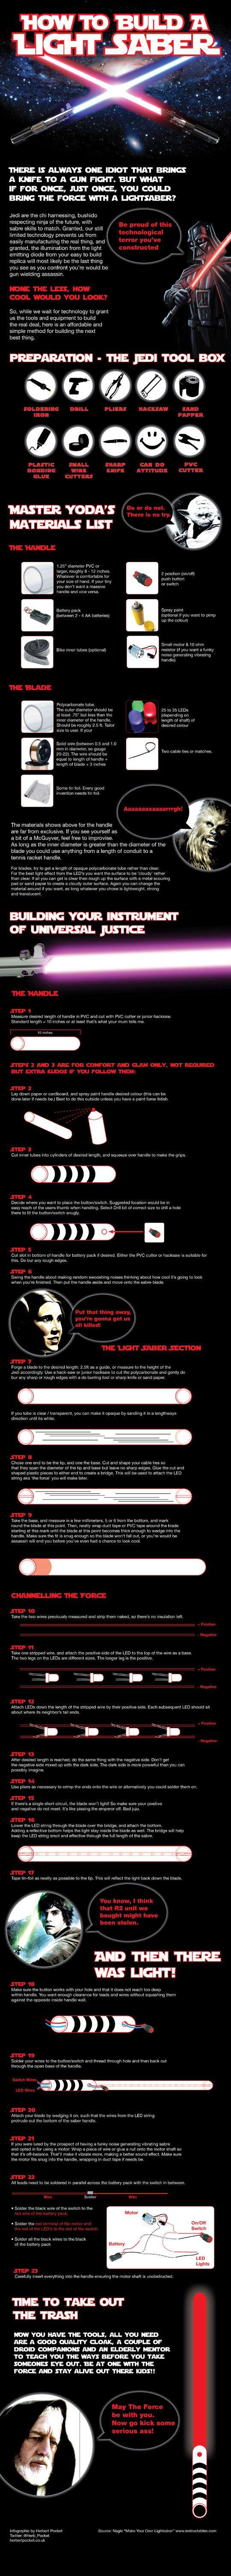 How To Build A Light Saber